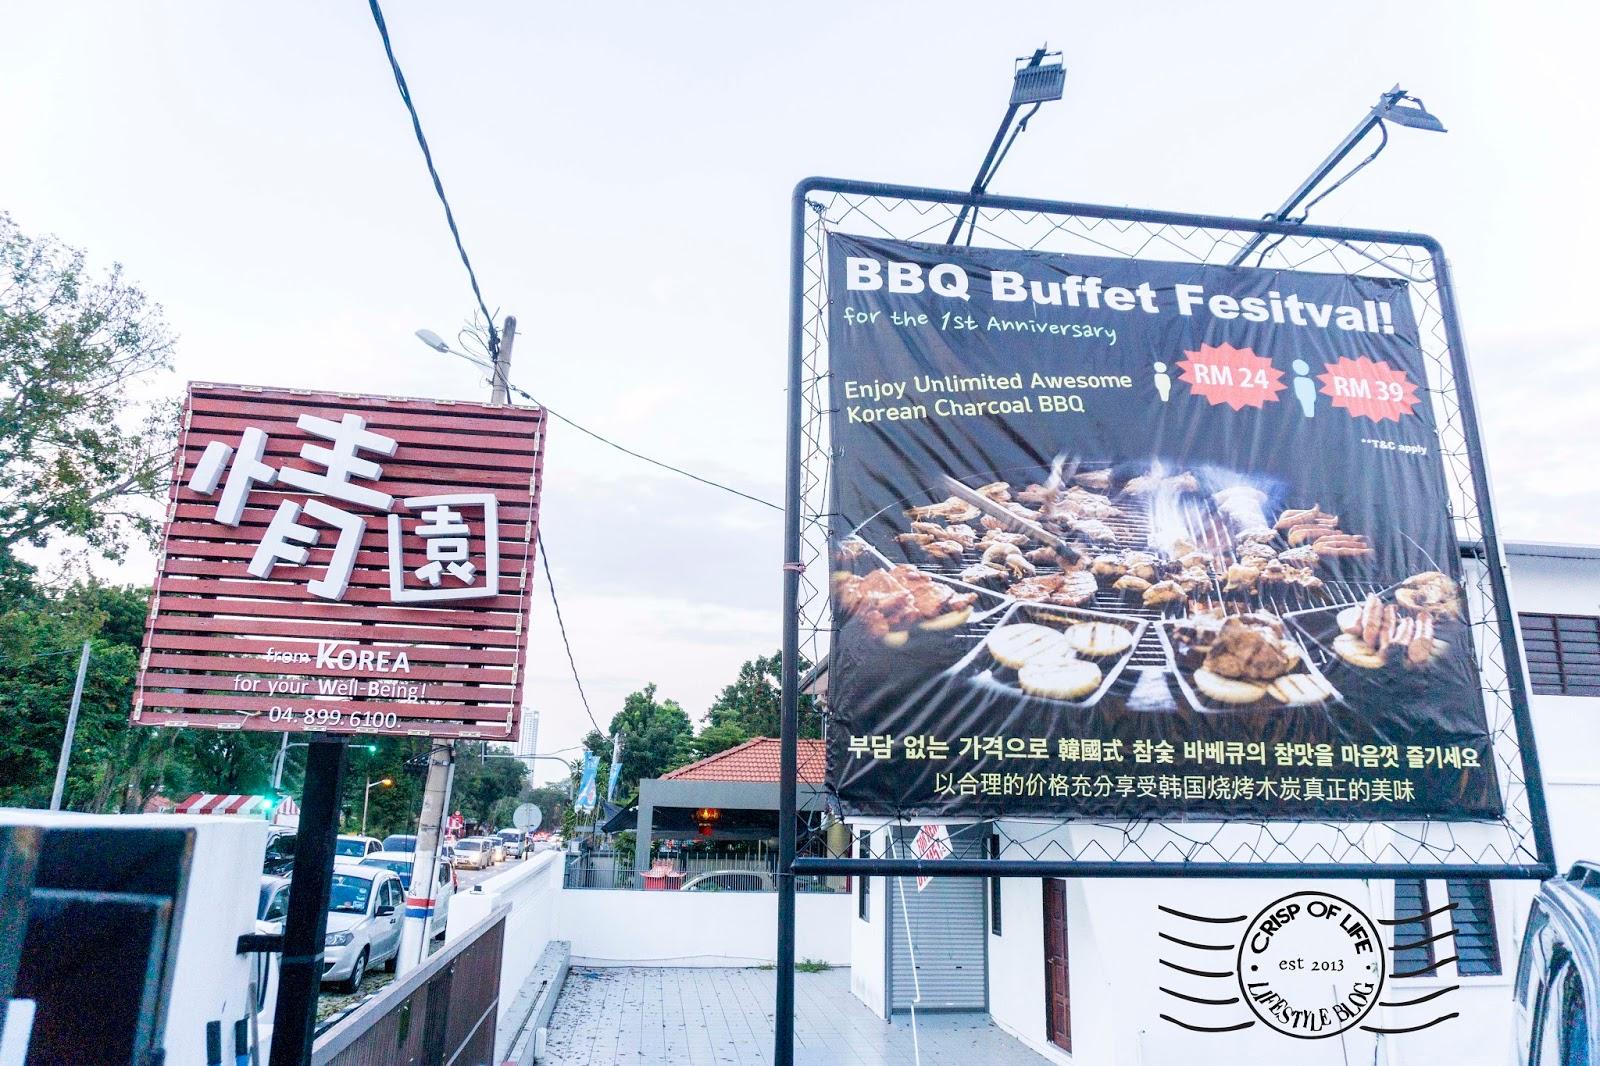 Jungwon Korean BBQ Buffet, Mount Erskine, Penang